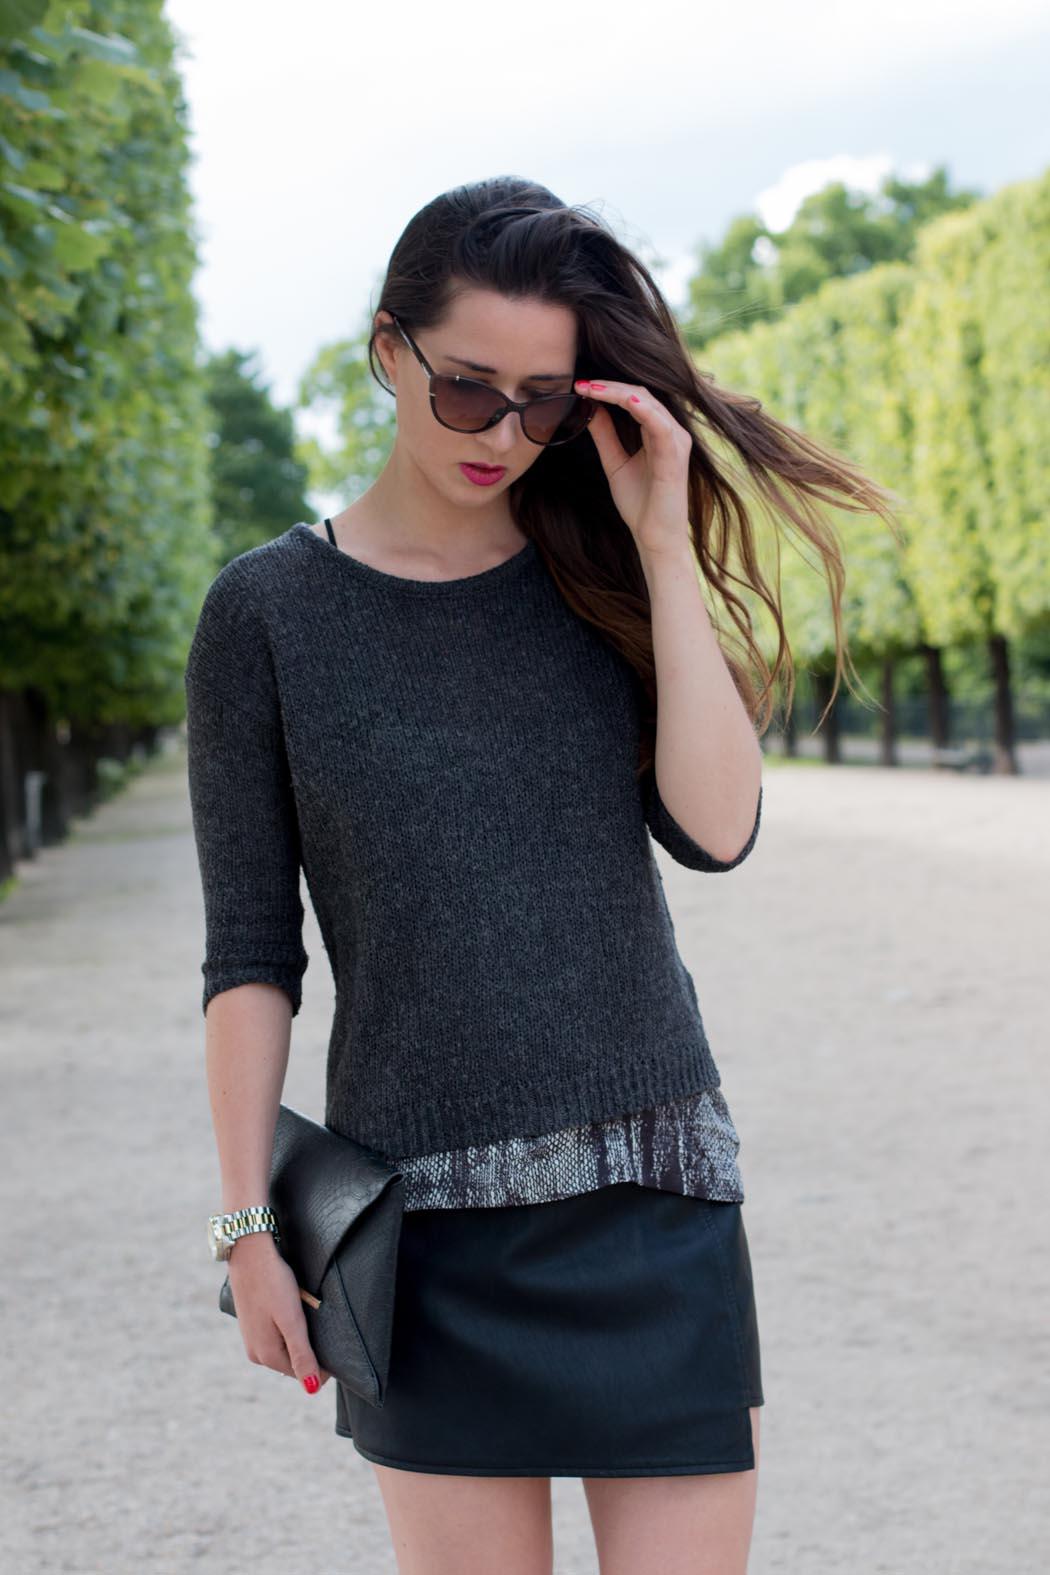 Lindarella-Paris-Fashionblogger-Michael-Kors-Bcbg-allblack-5